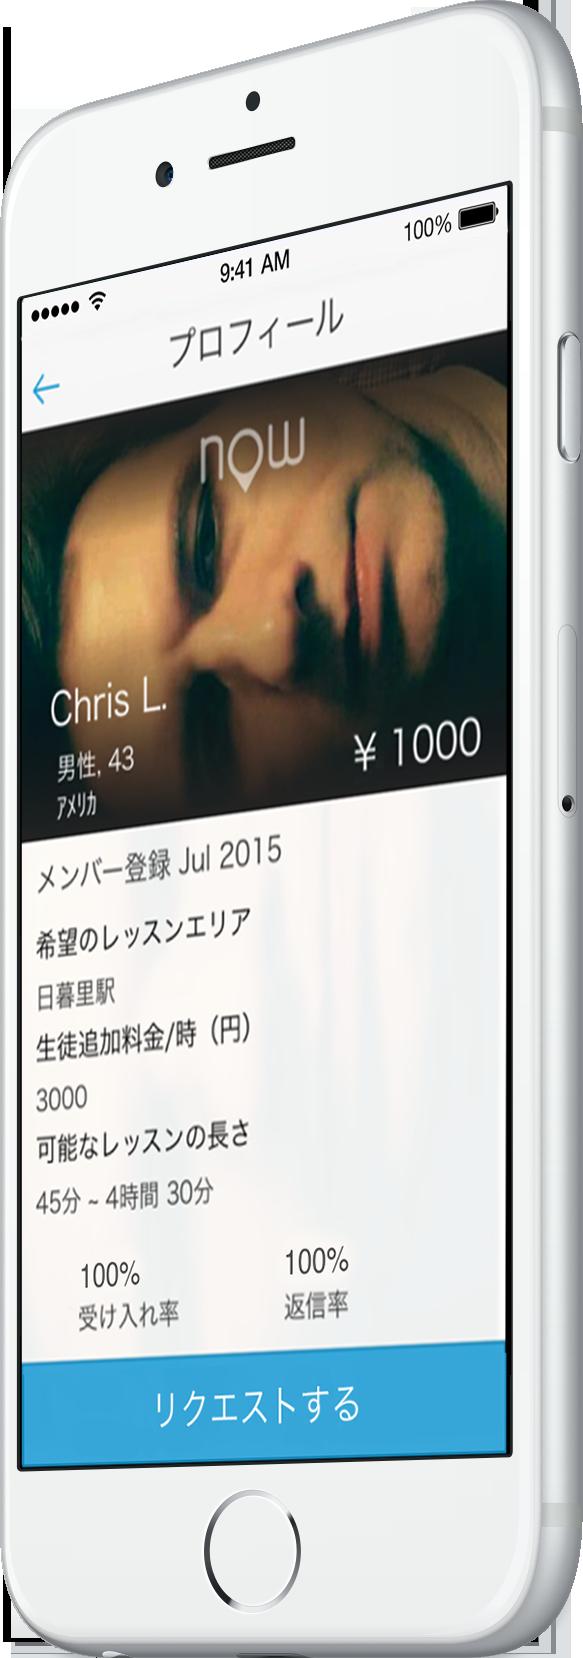 Chris_side.png